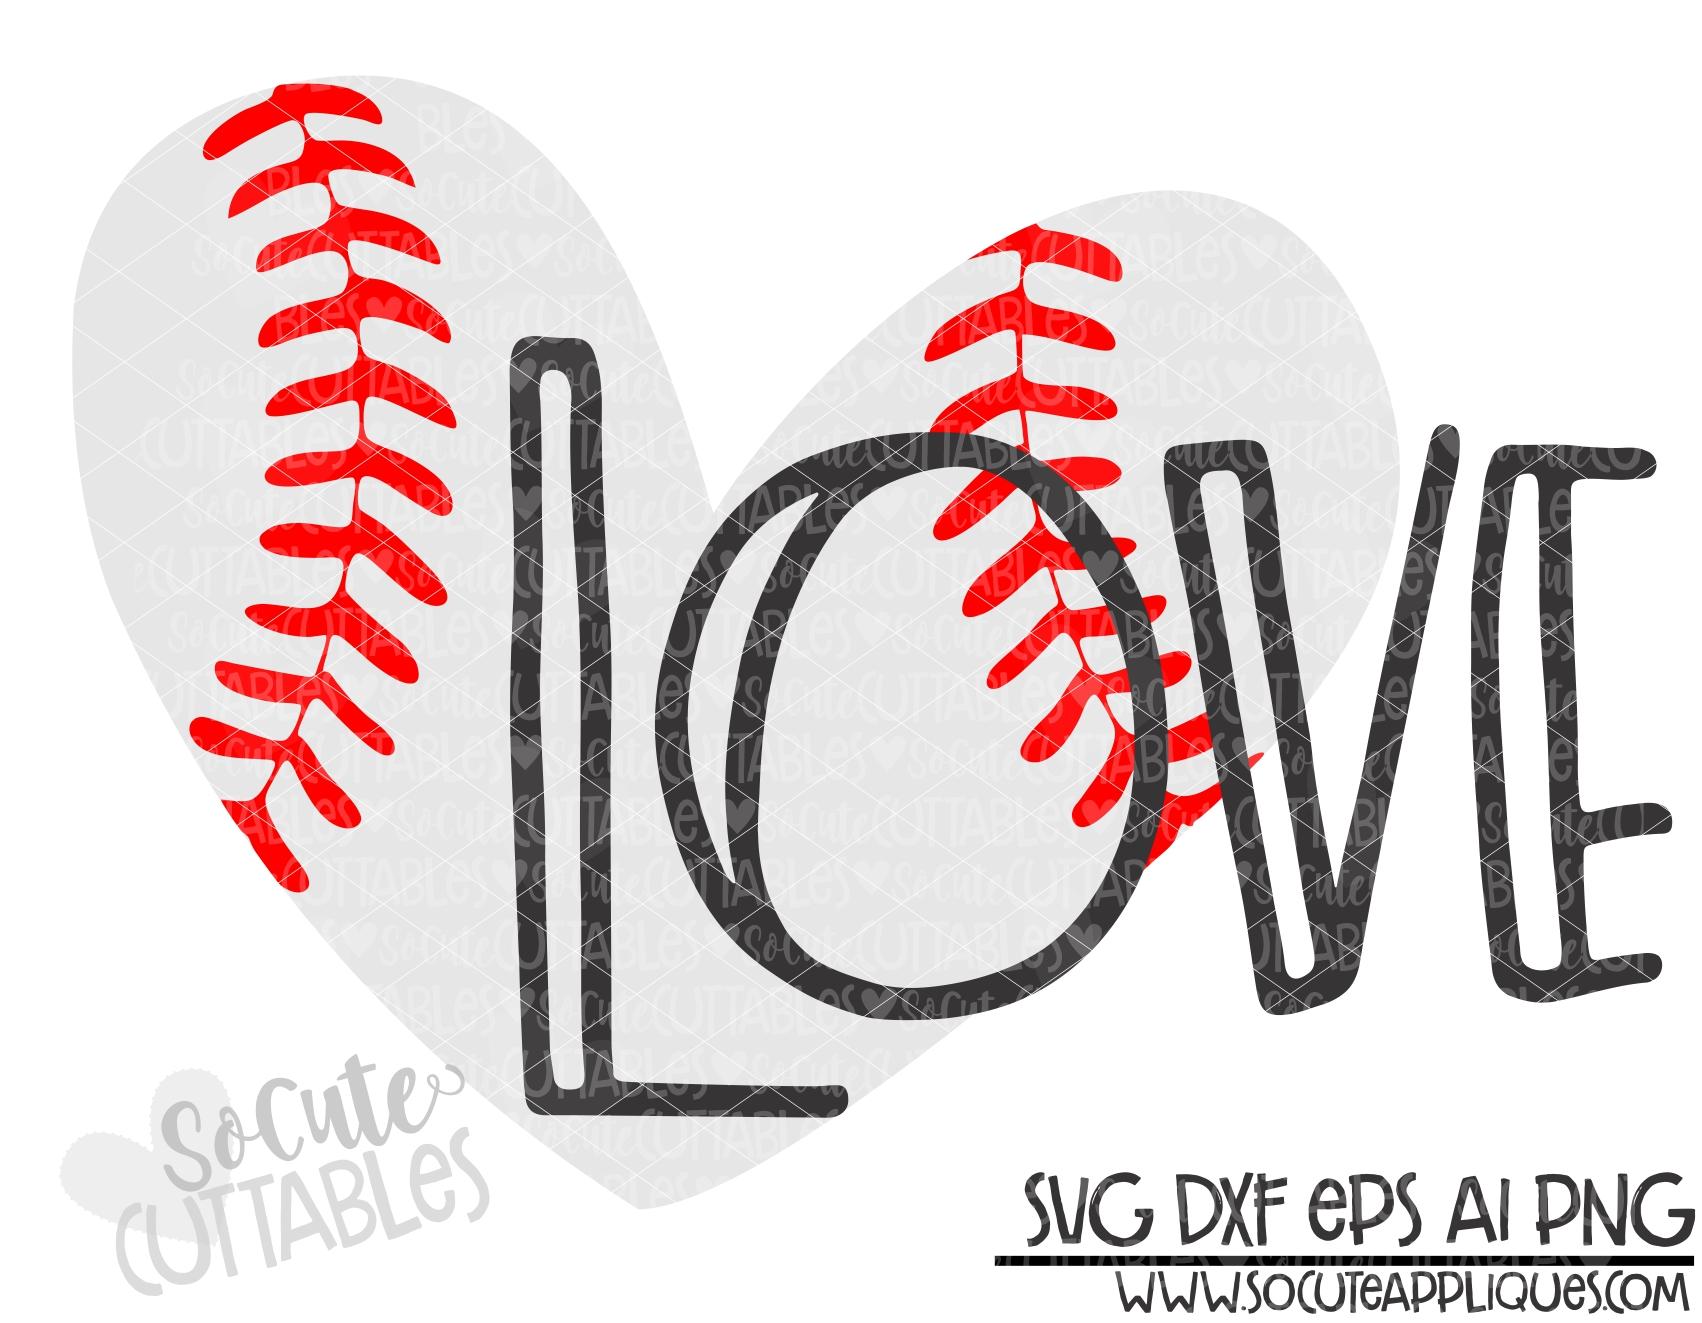 Download love baseball heart 19 scc SVG - socuteappliques.net